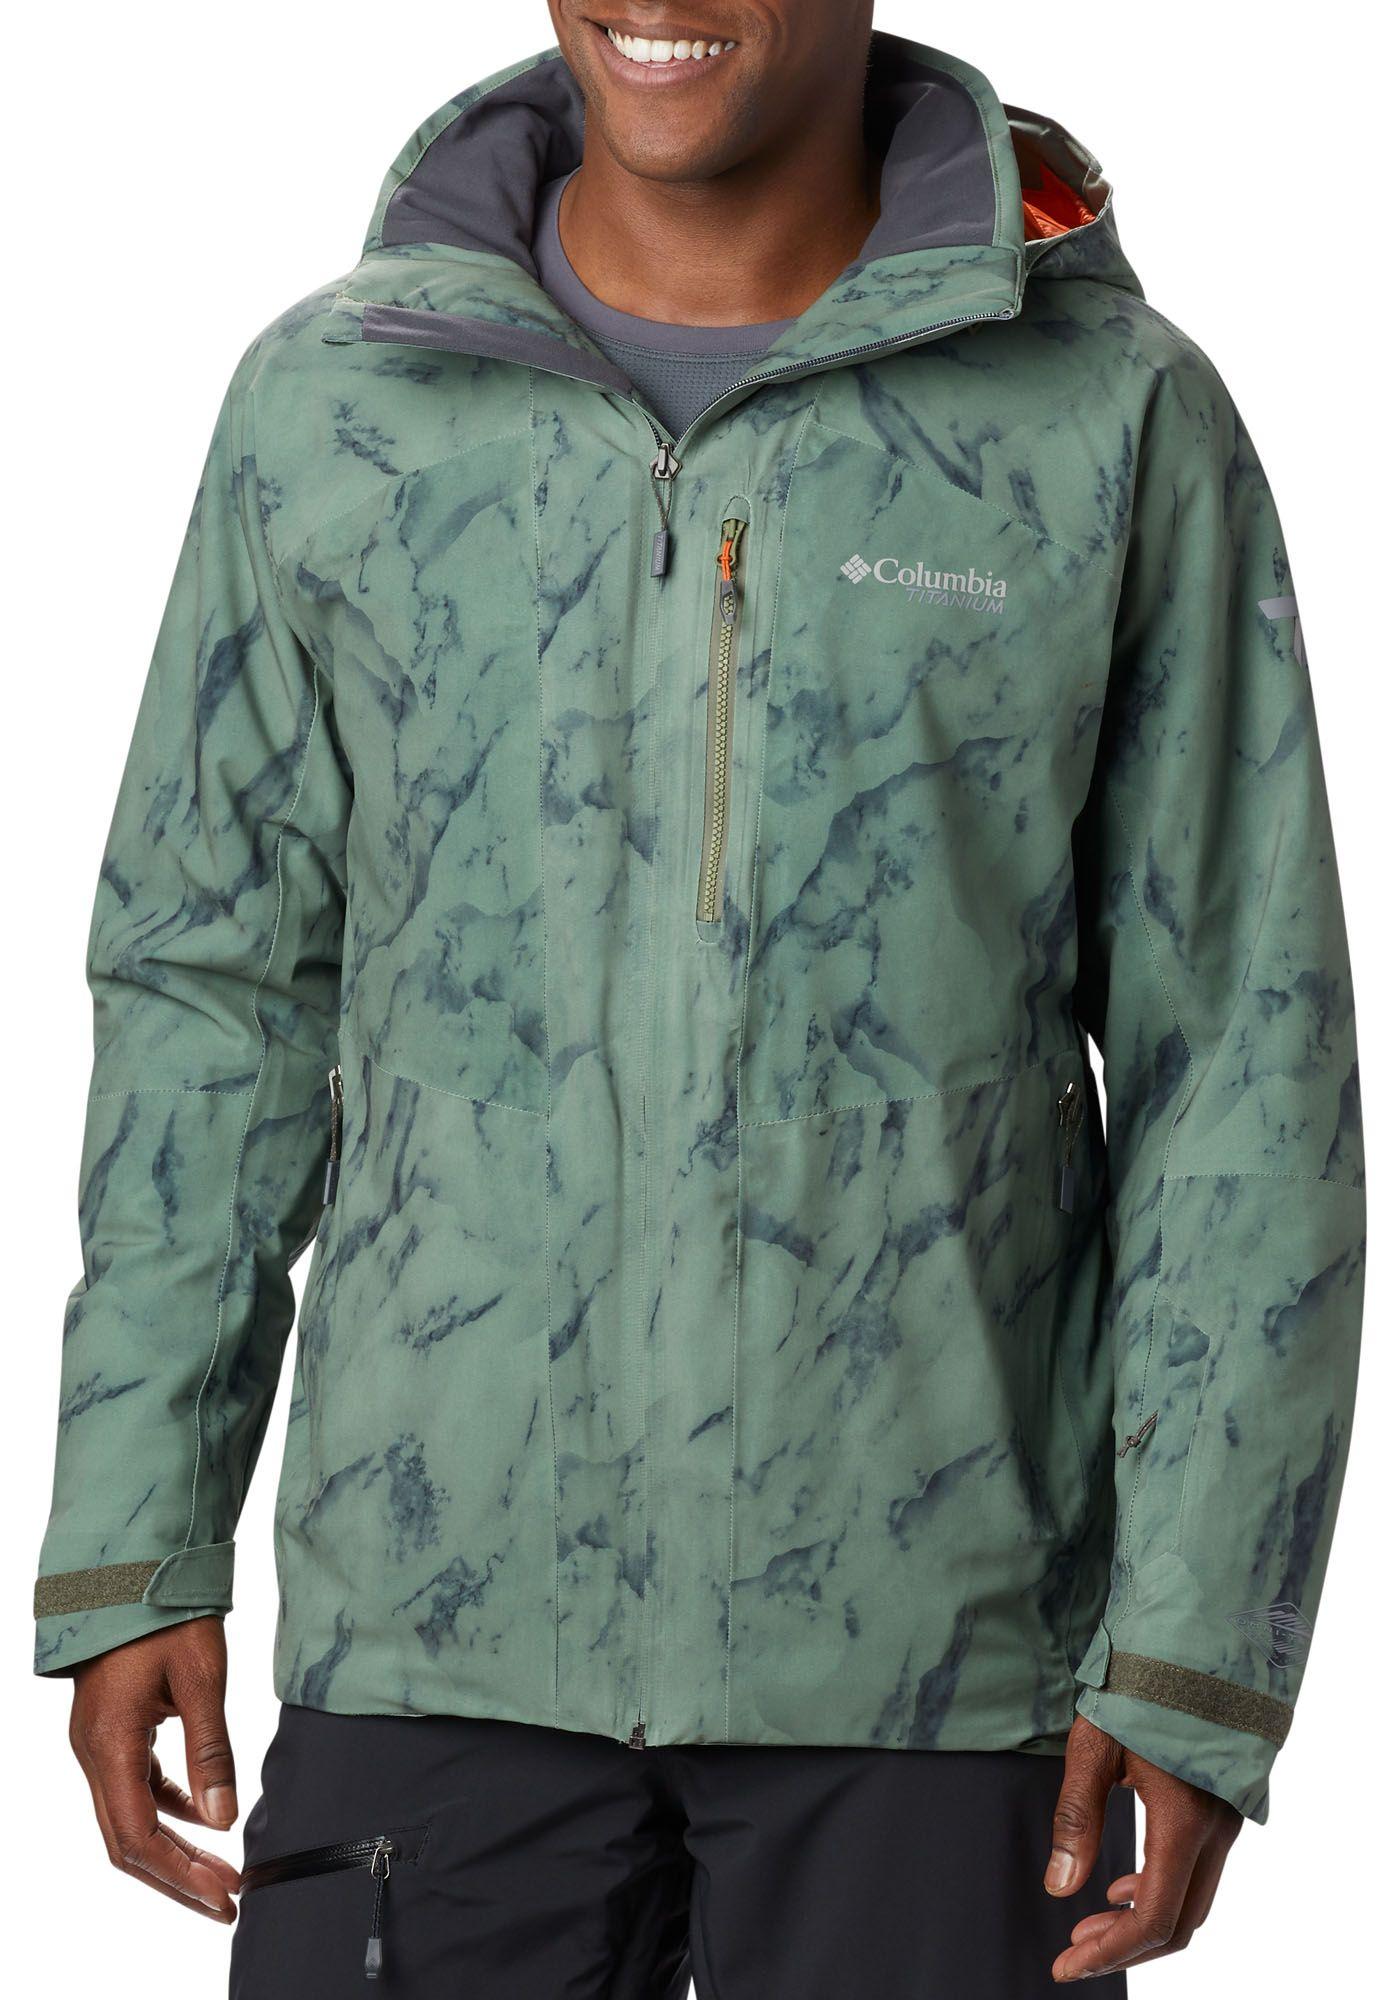 Columbia Men's Titanium Snow Rival Jacket